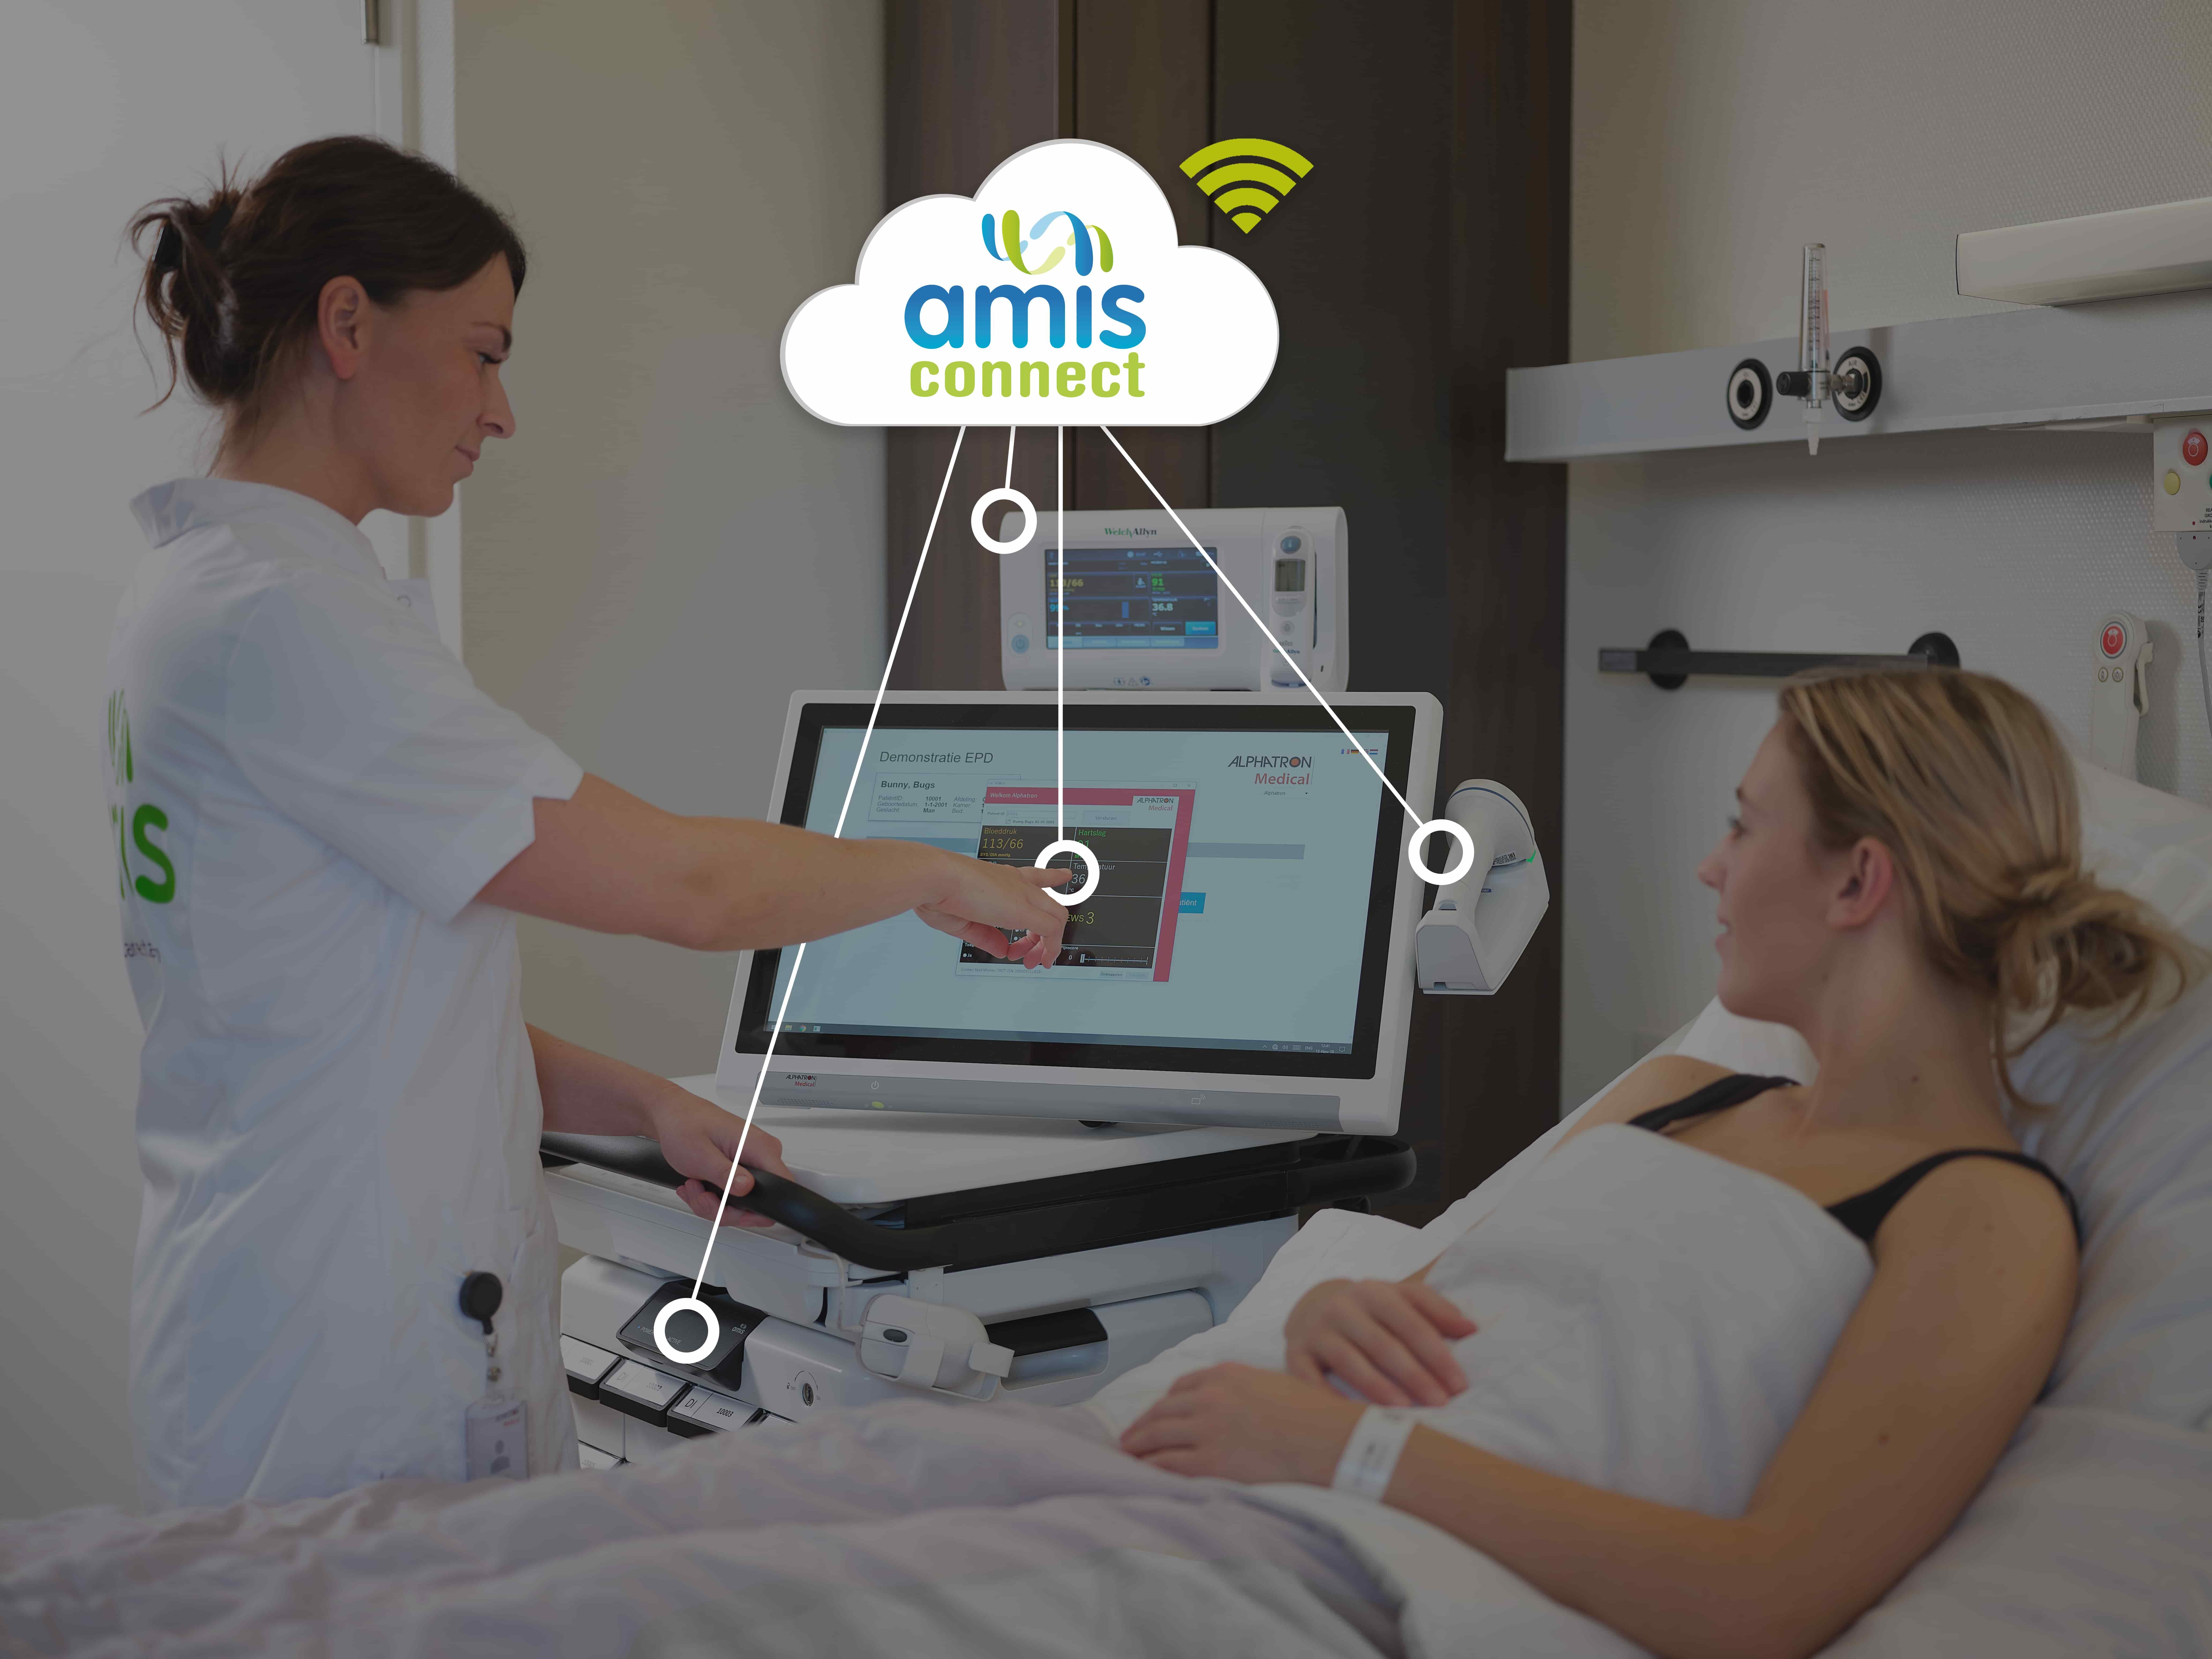 Product AMiS-X